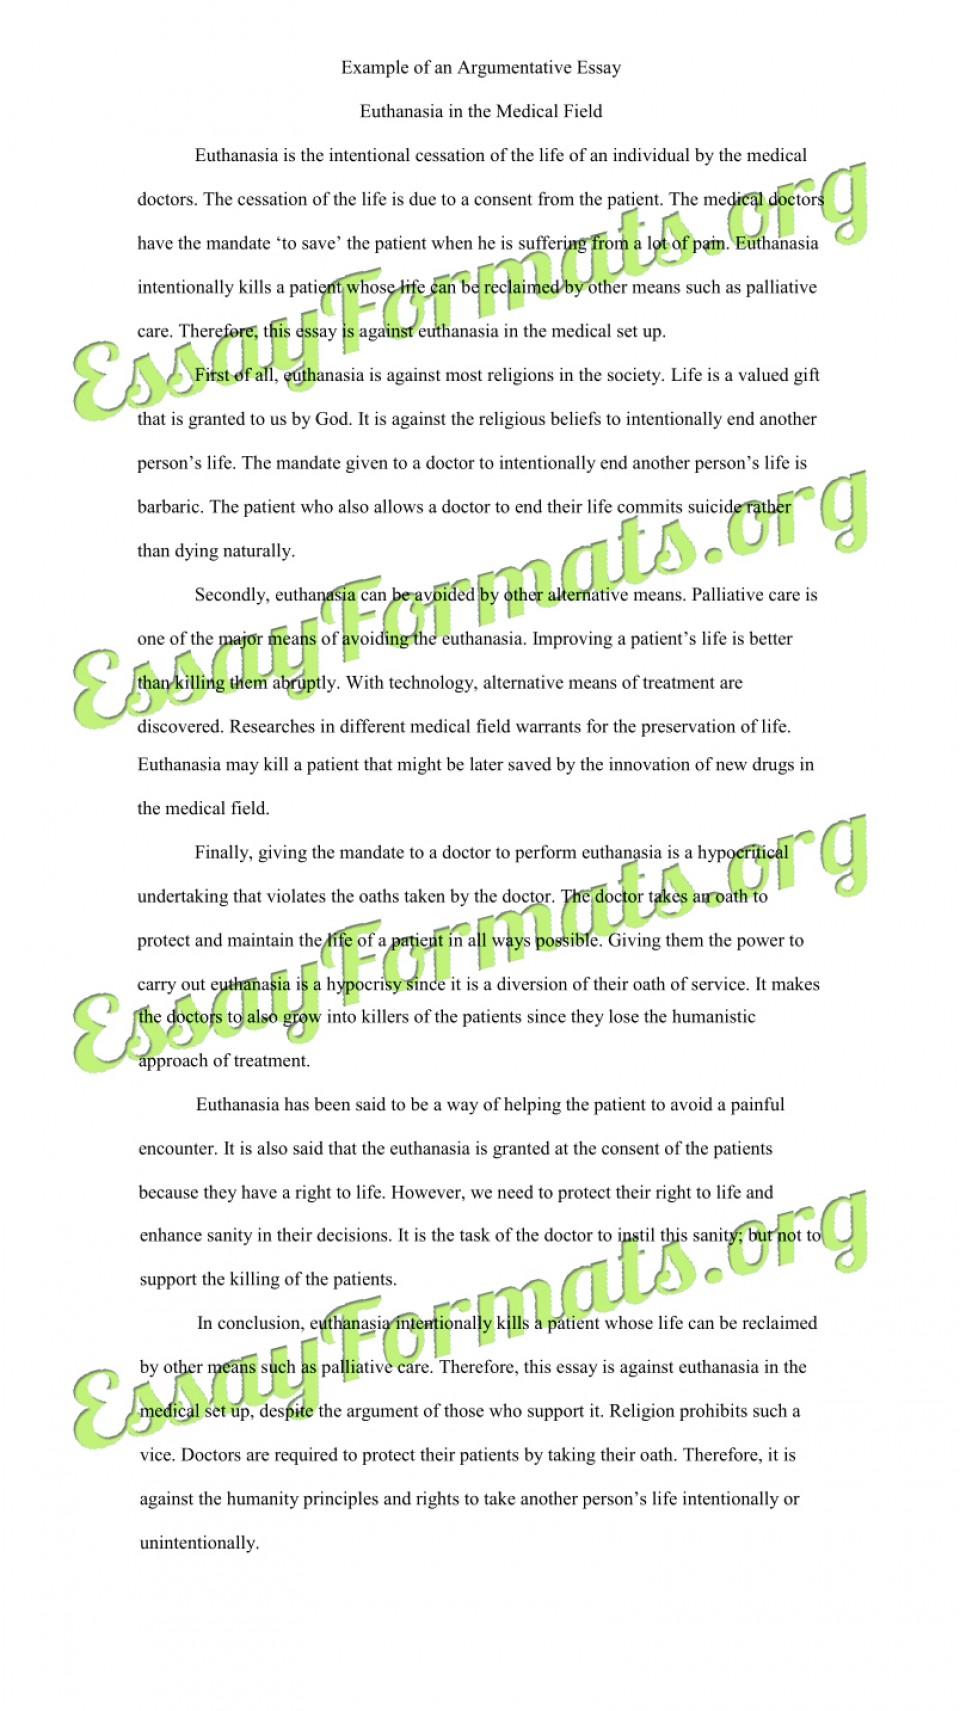 005 Essay Example Euthanasia Argumentative Counter Argument Persuasive Examples L Stirring Pdf Introduction Outline 960